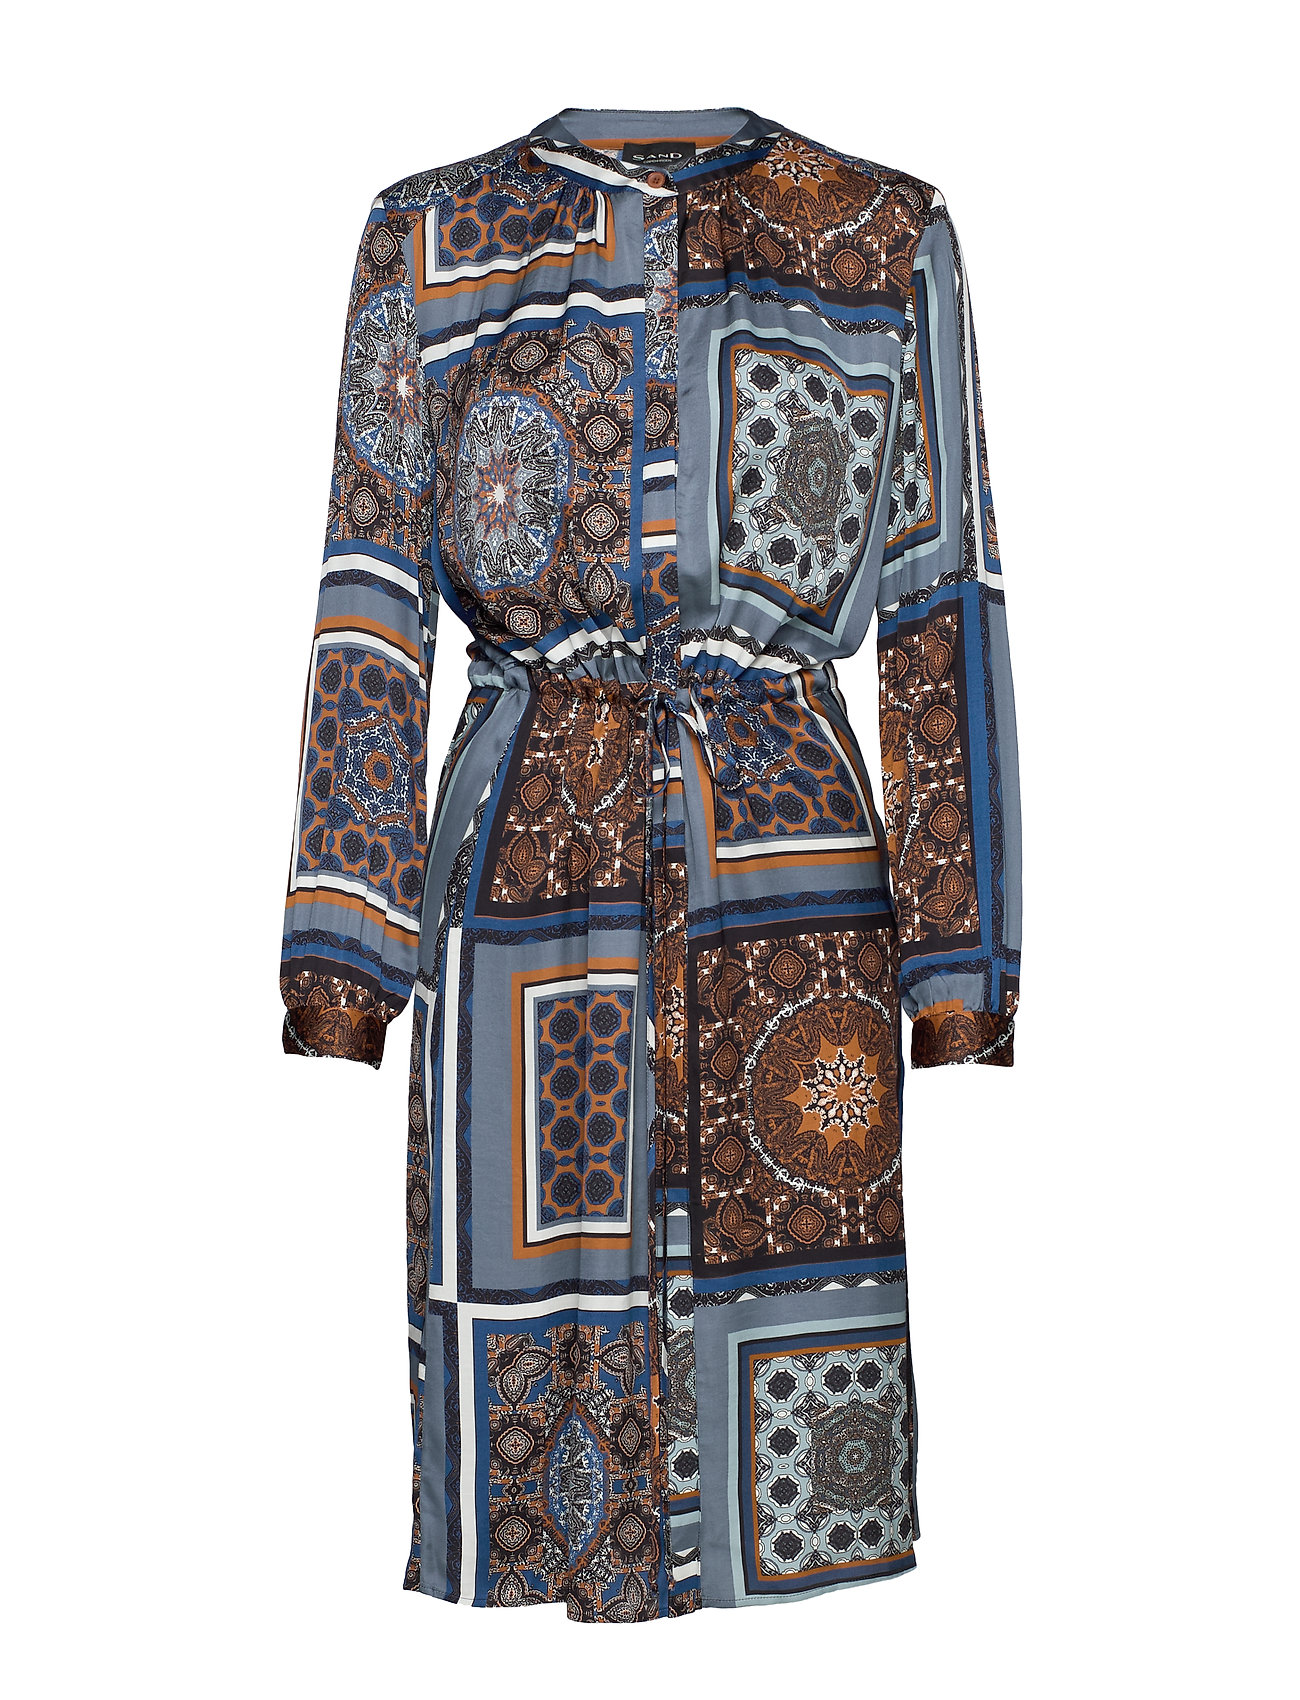 SAND 3339 - Zihia Dress - MEDIUM BLUE